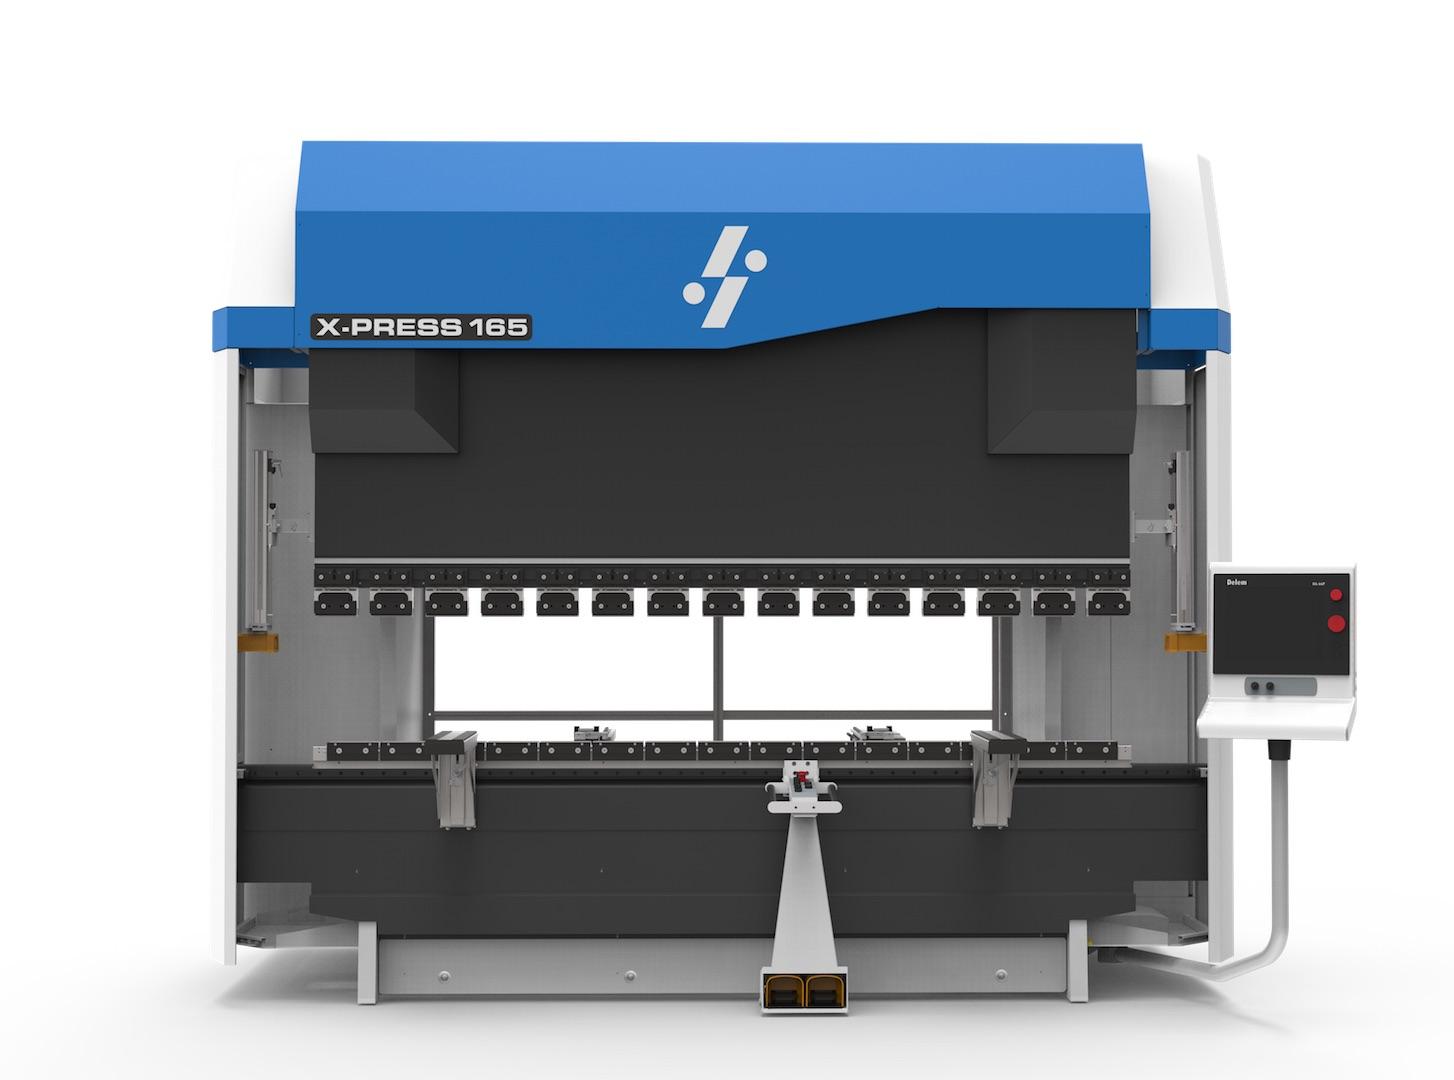 prensa plegadora next híbrida eléctrica hidráulica